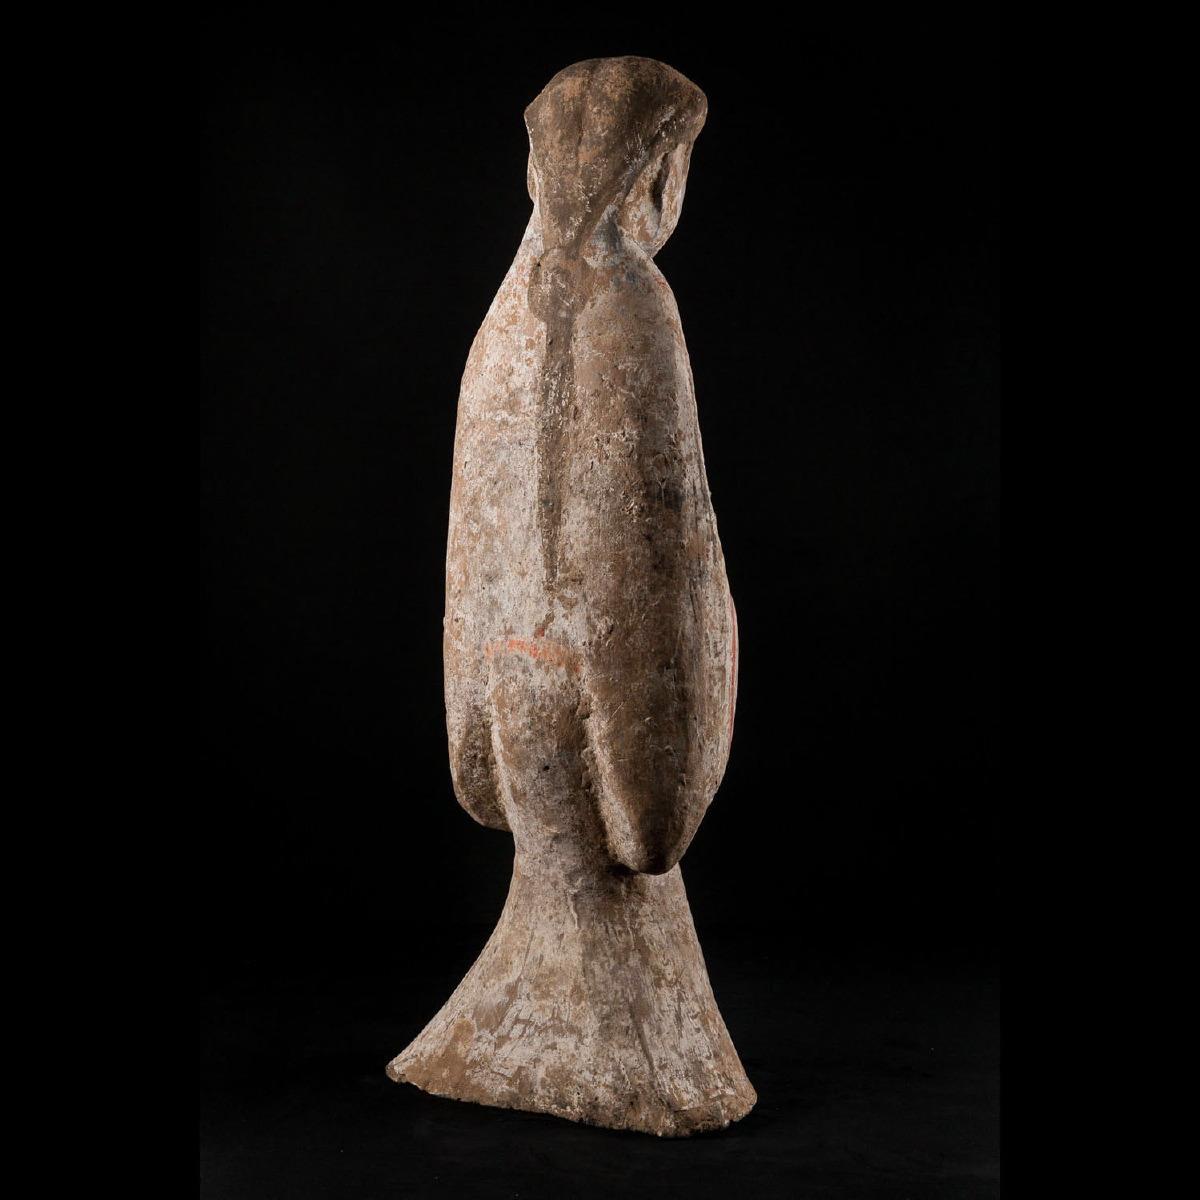 Photo of servant-china-han-dynasty-ceramic-terracotta-thermoluminescent-test